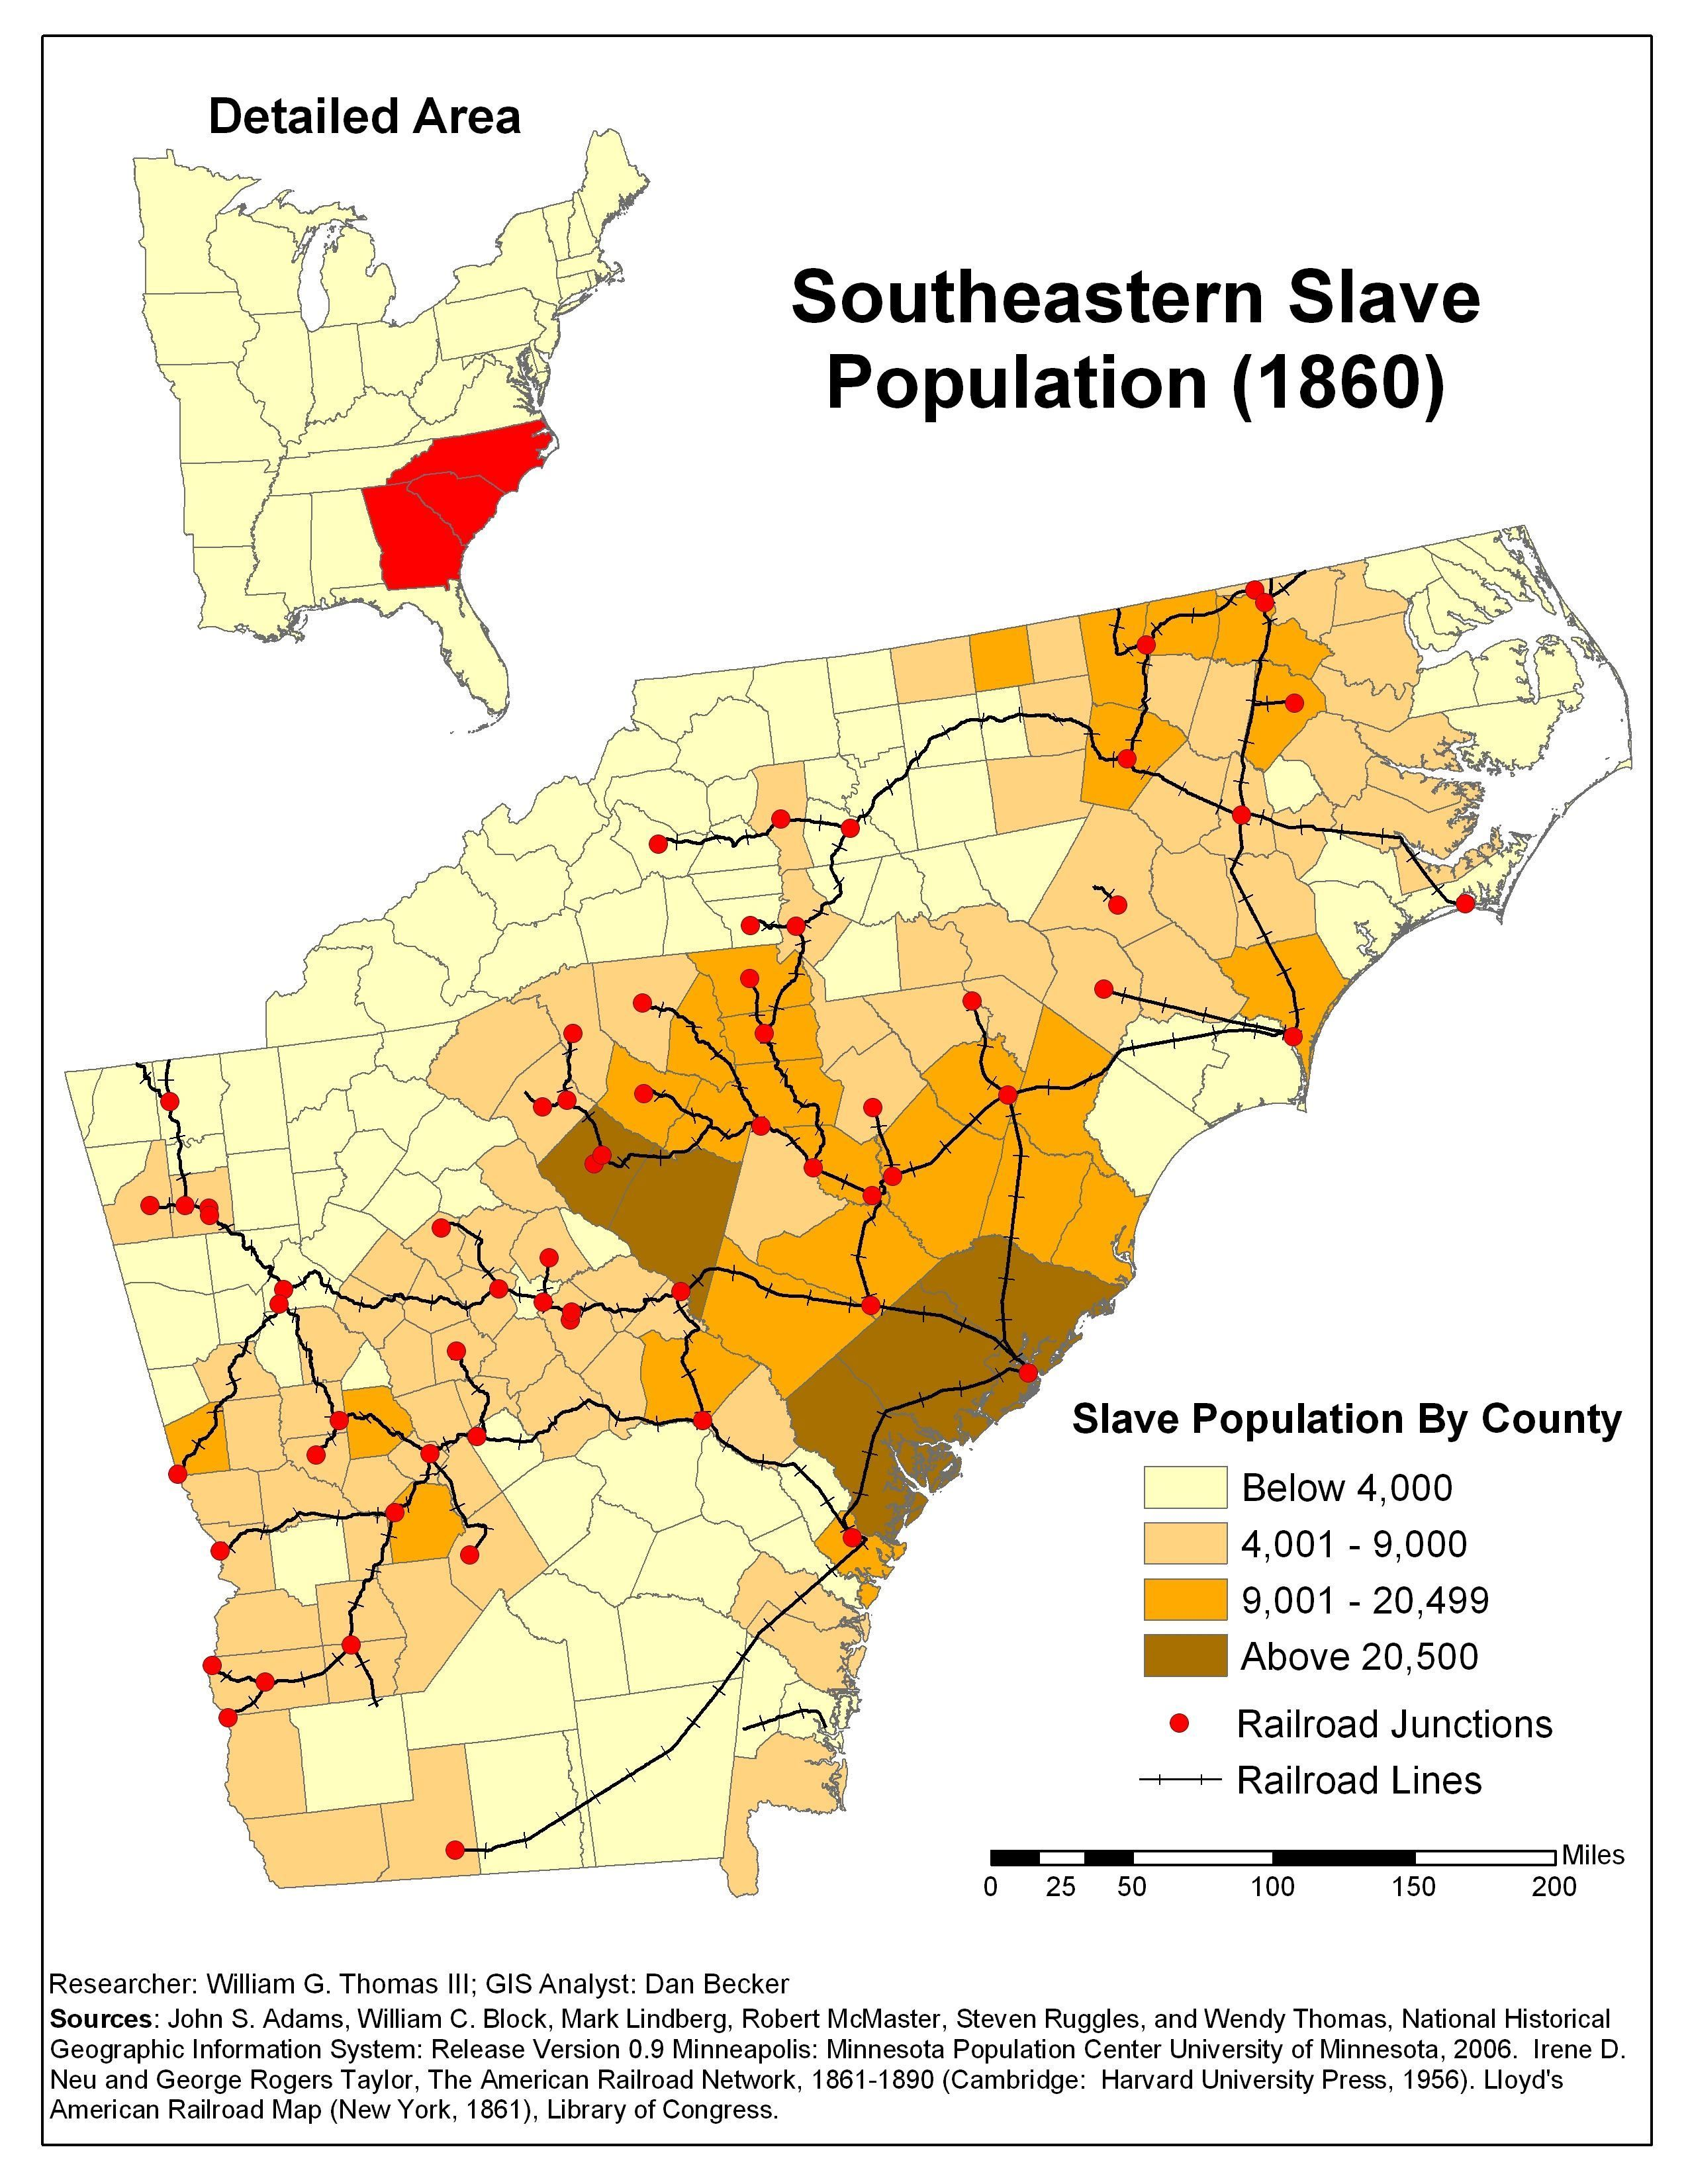 Map Of America 1820.1860 Southeastern Slave Population 1820 1860 Antebellum America